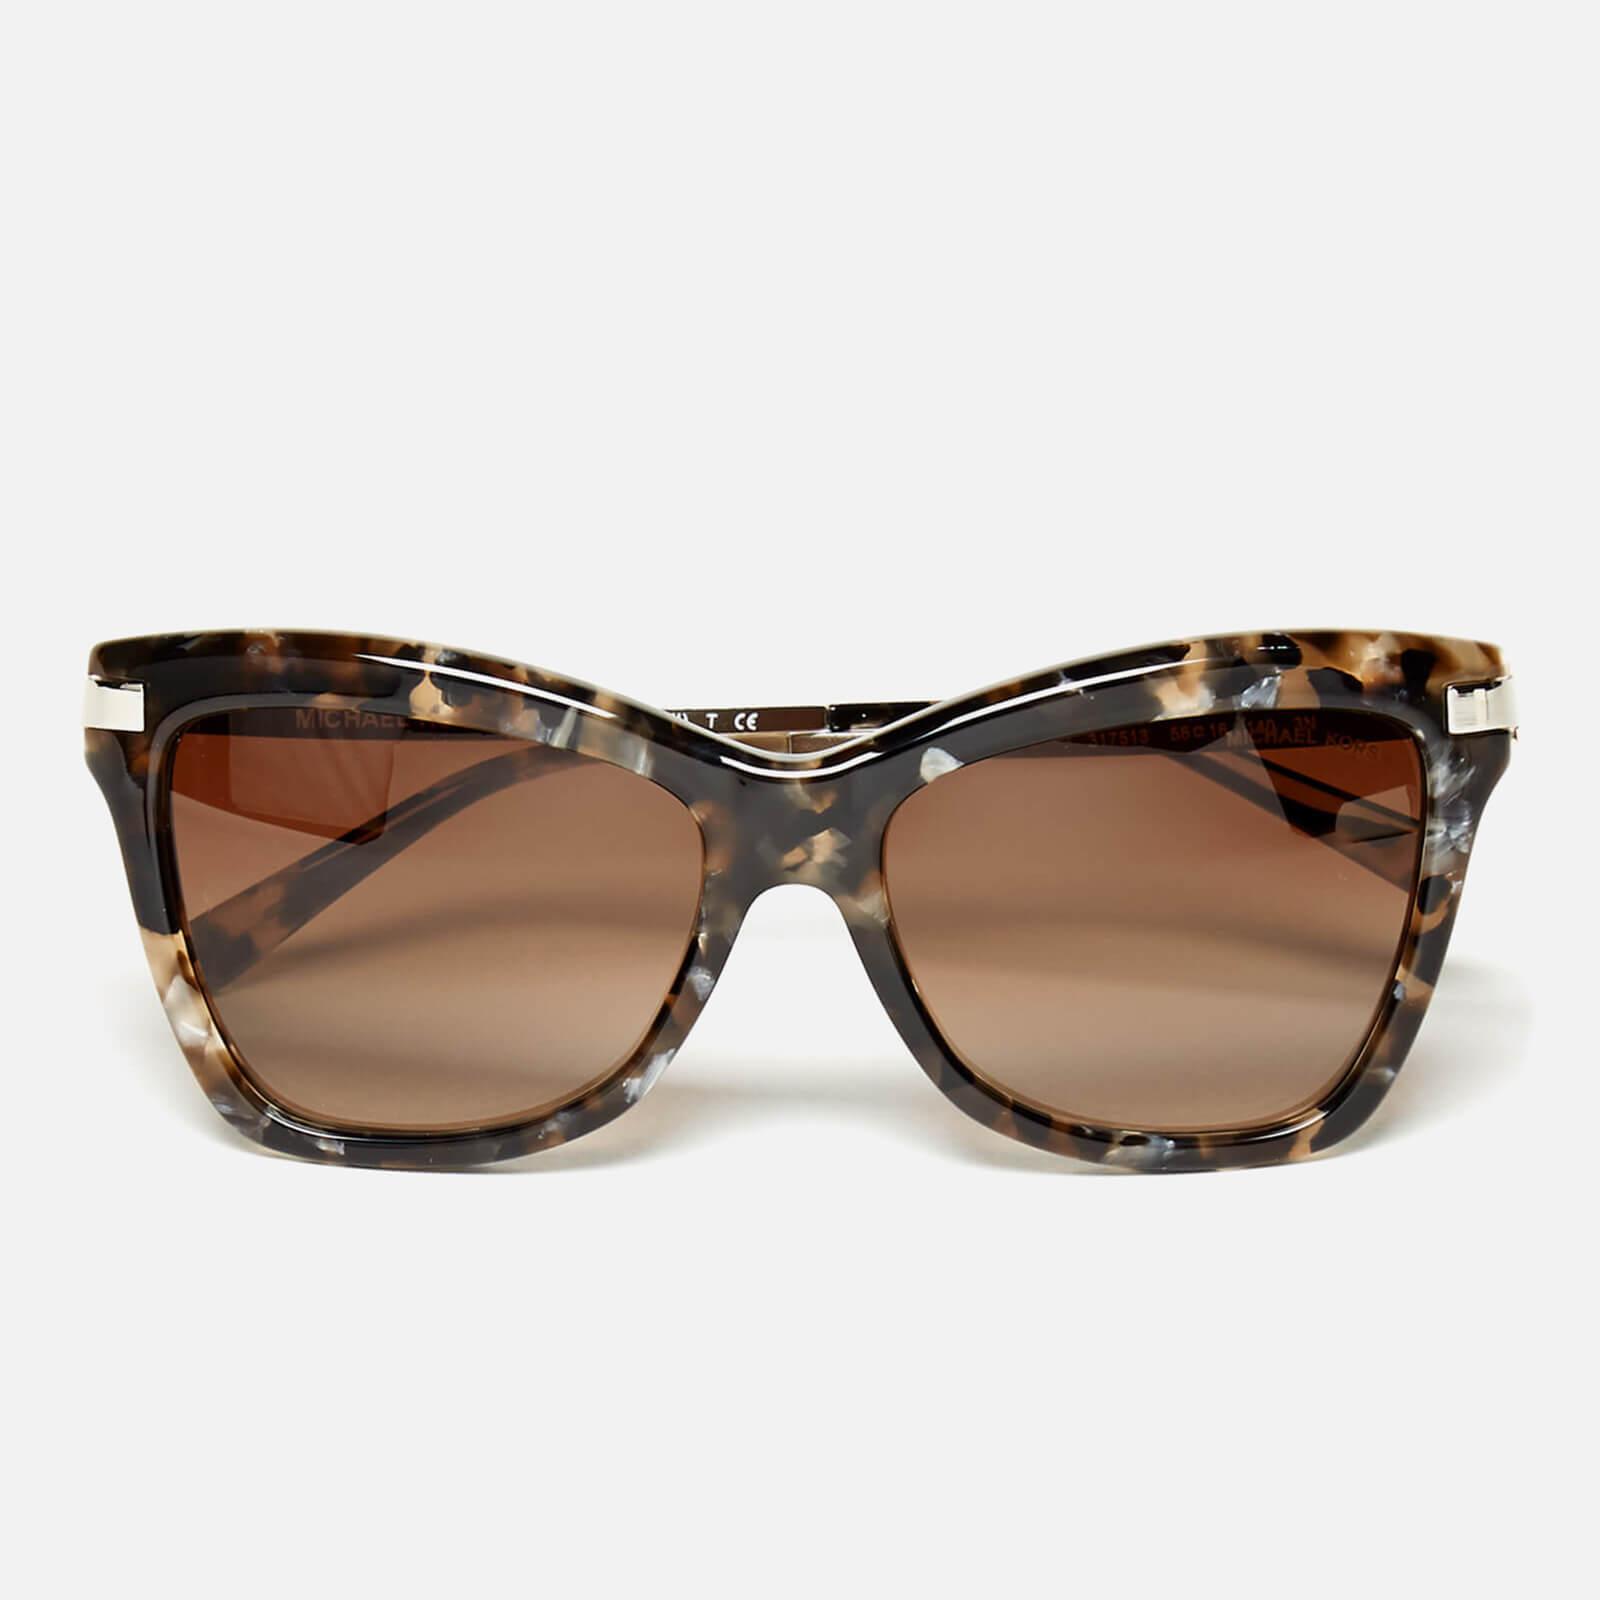 a5bb8793af568 MICHAEL MICHAEL KORS Women s Audrina III Sunglasses - Brown Mosaic Womens  Accessories